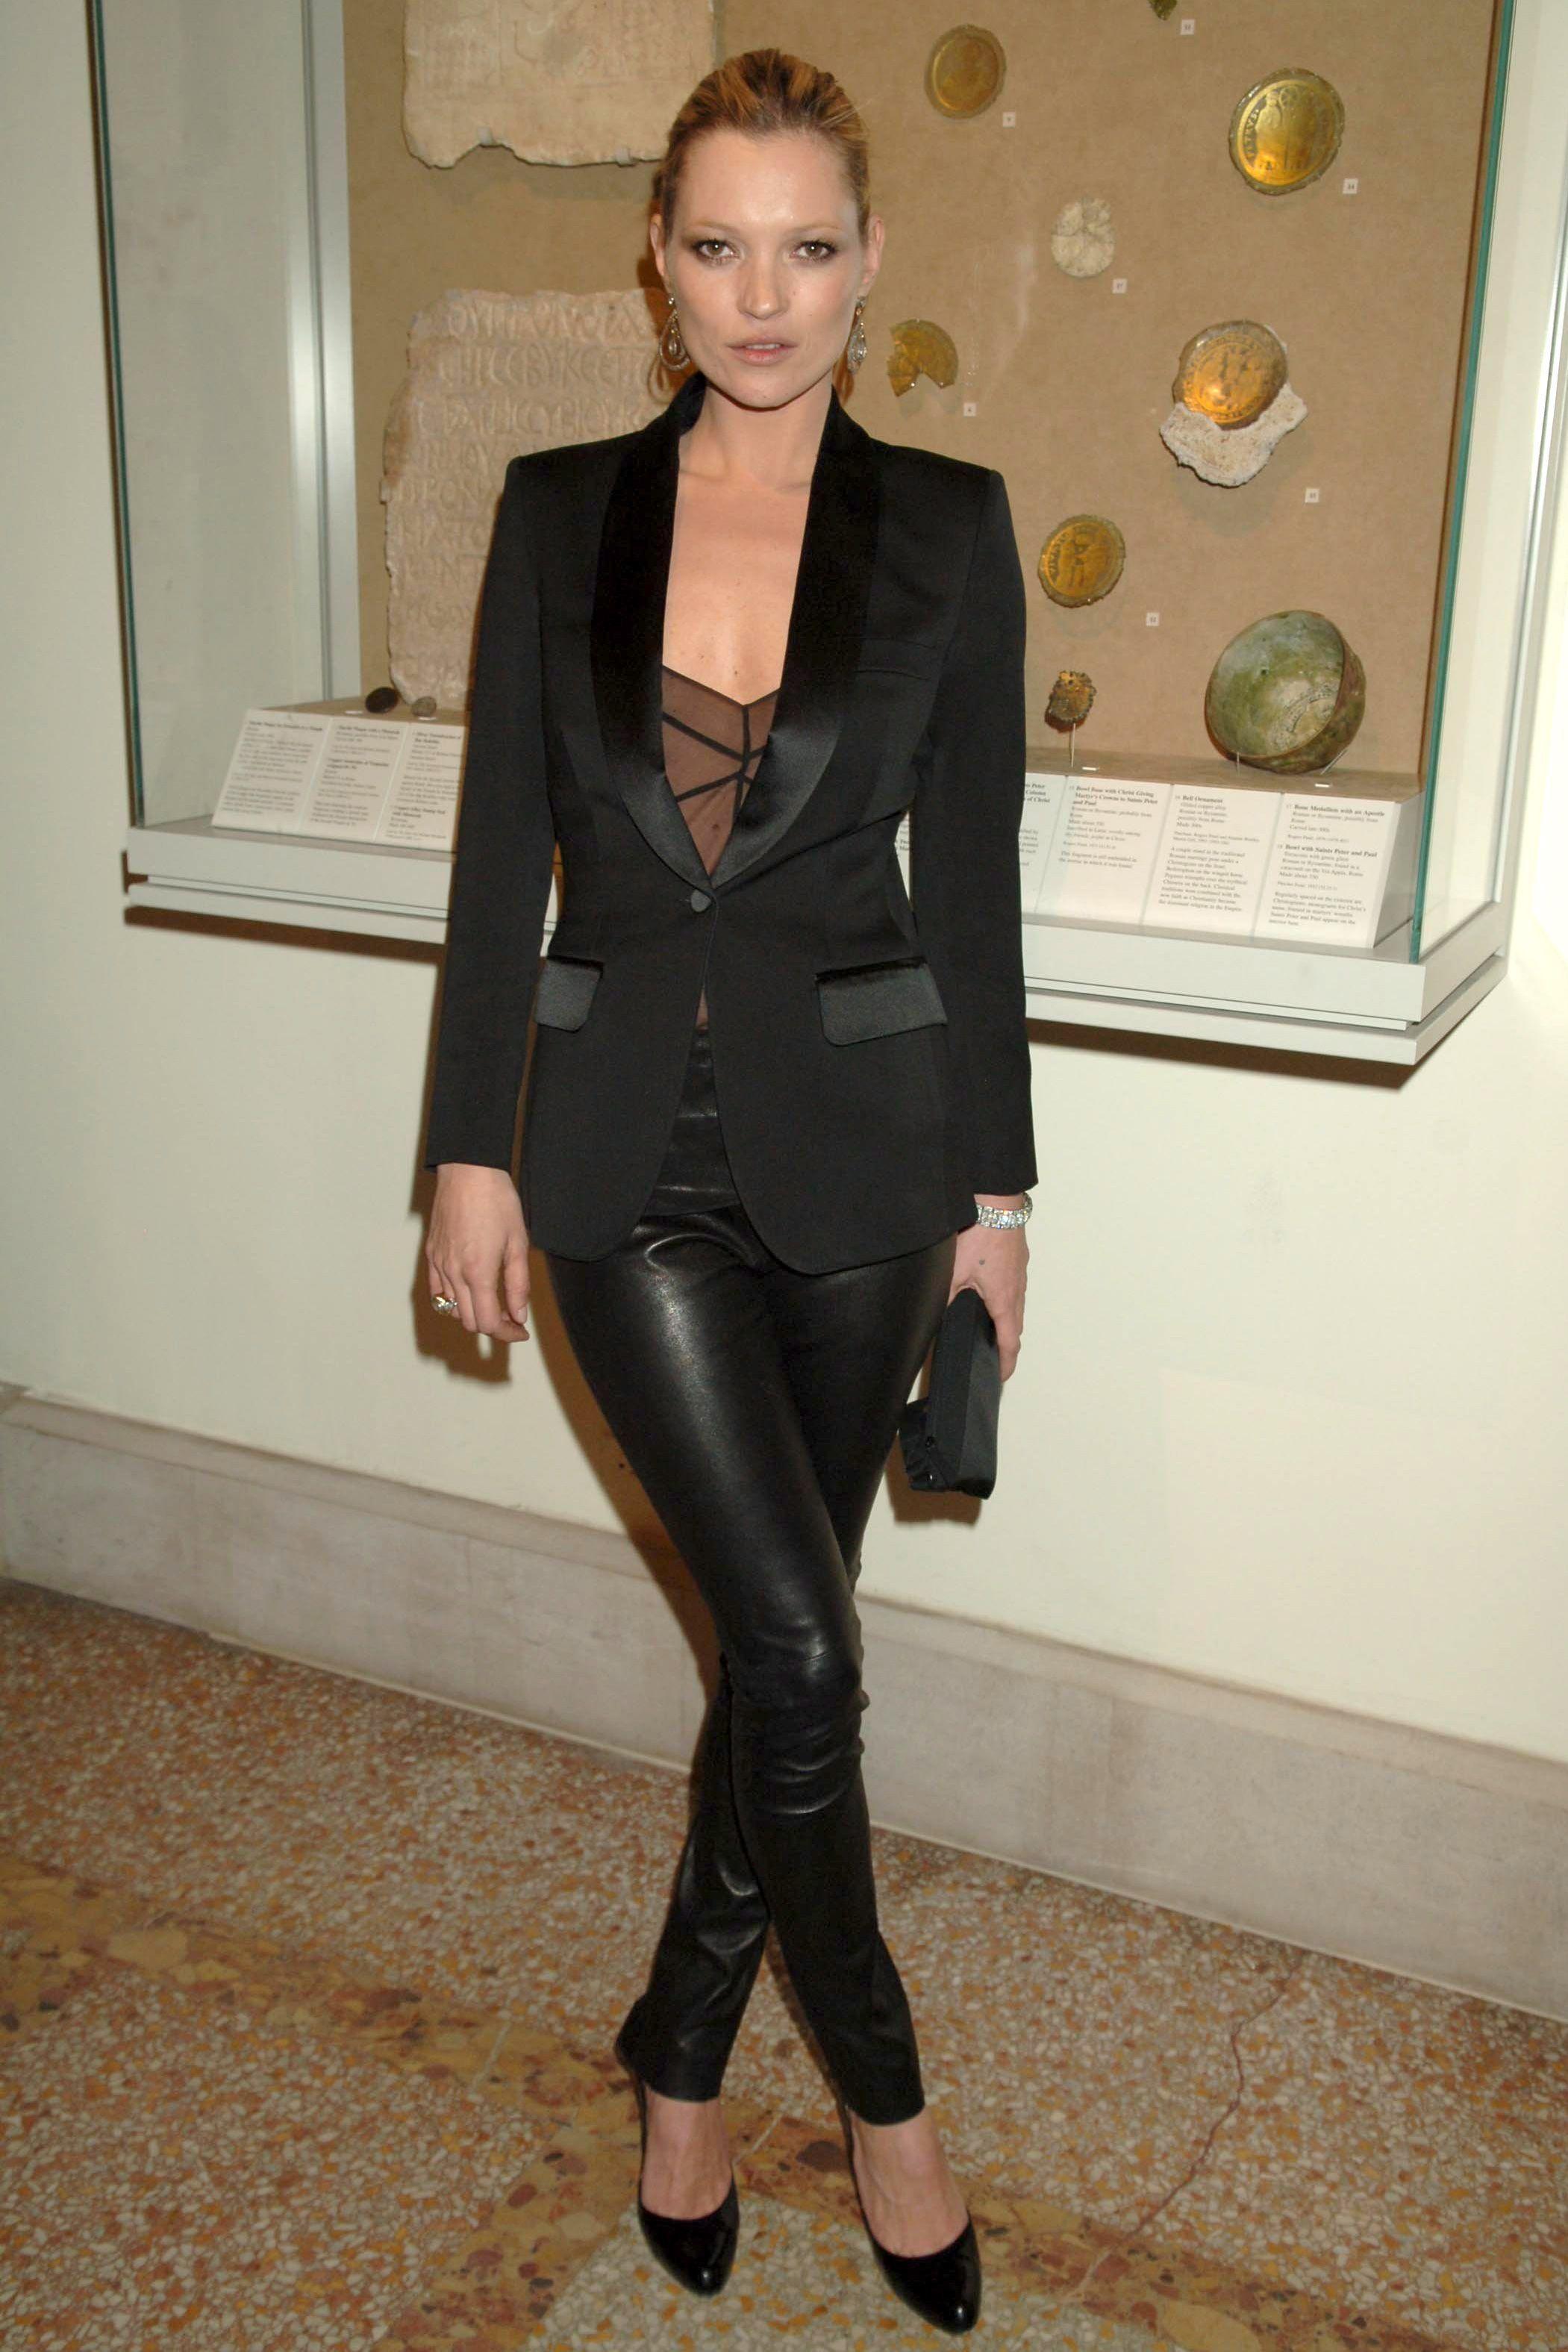 Kate Moss in all black; leather pants, tuxedo jacket & bustier